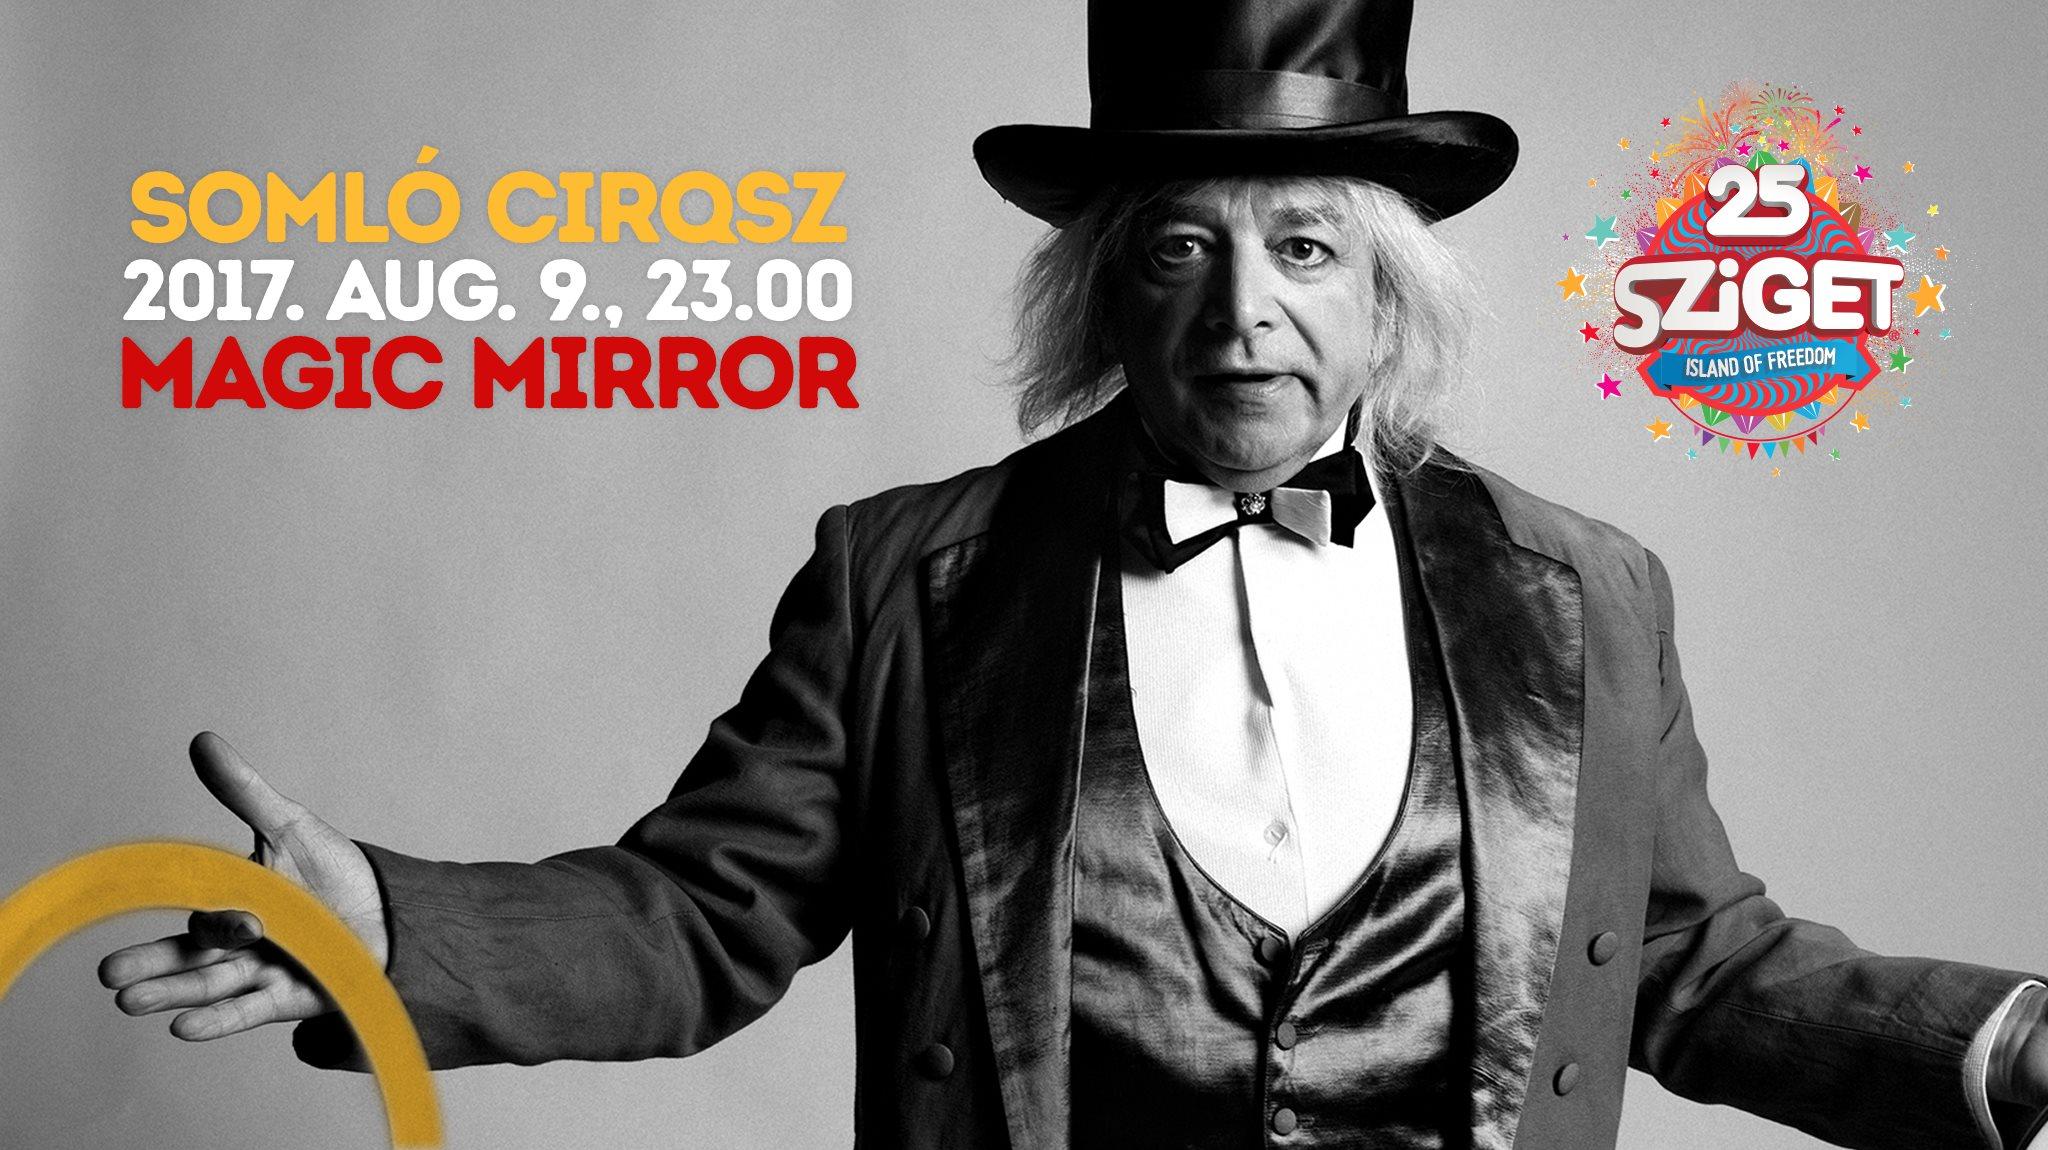 Somló Cirqsz – Sziget, Magic Mirror  2017. augusztus 9., 23:00